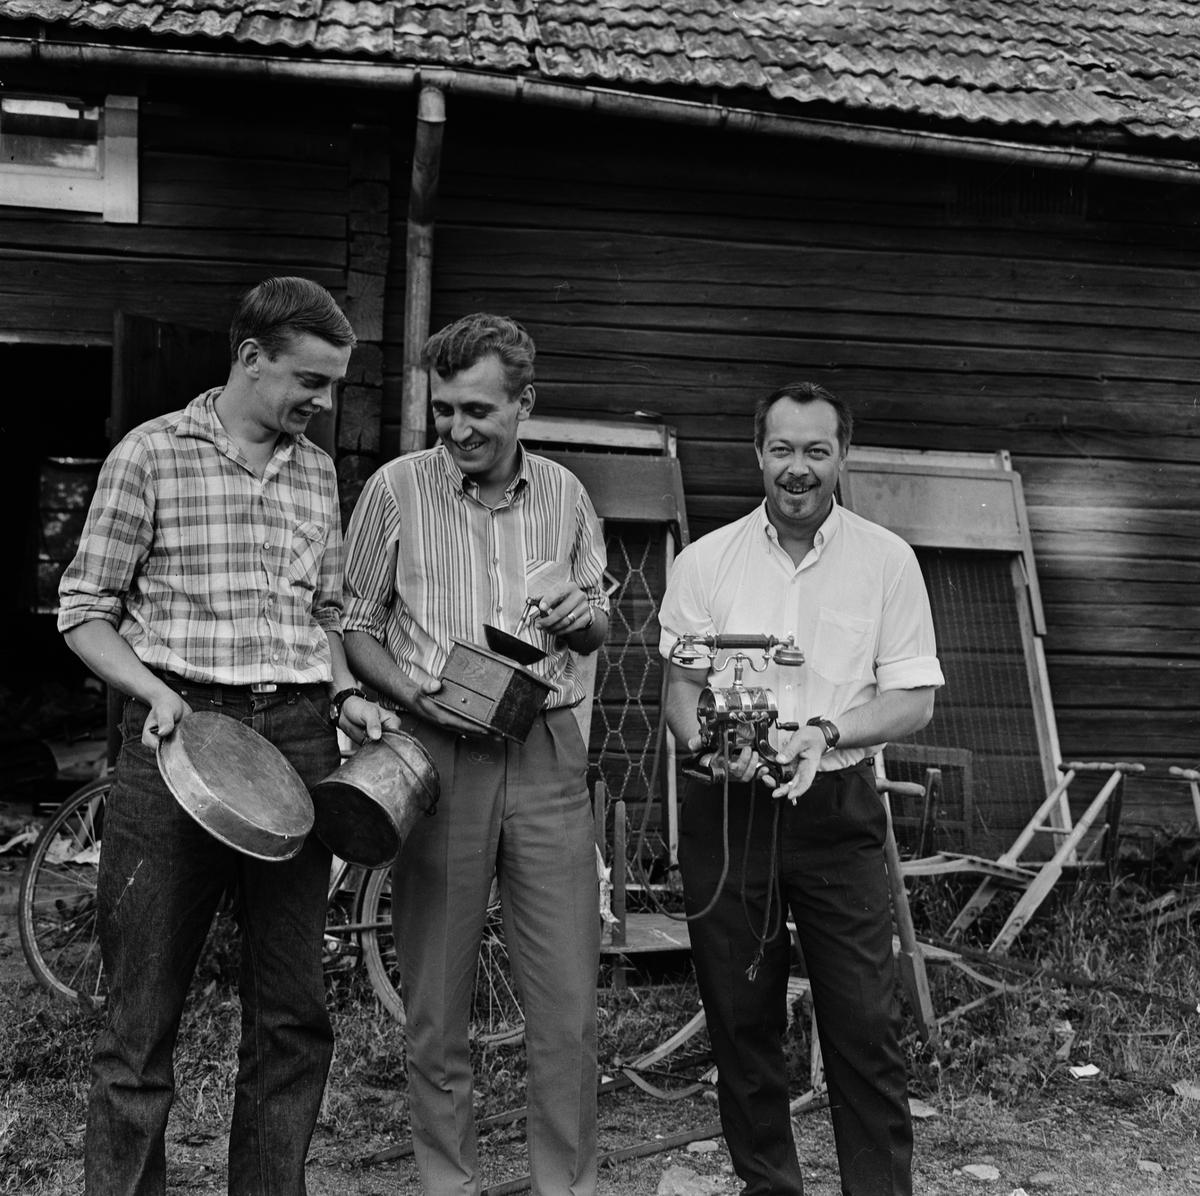 Tierp Hockeys loppmarknad, Tierp, Uppland, juli 1968